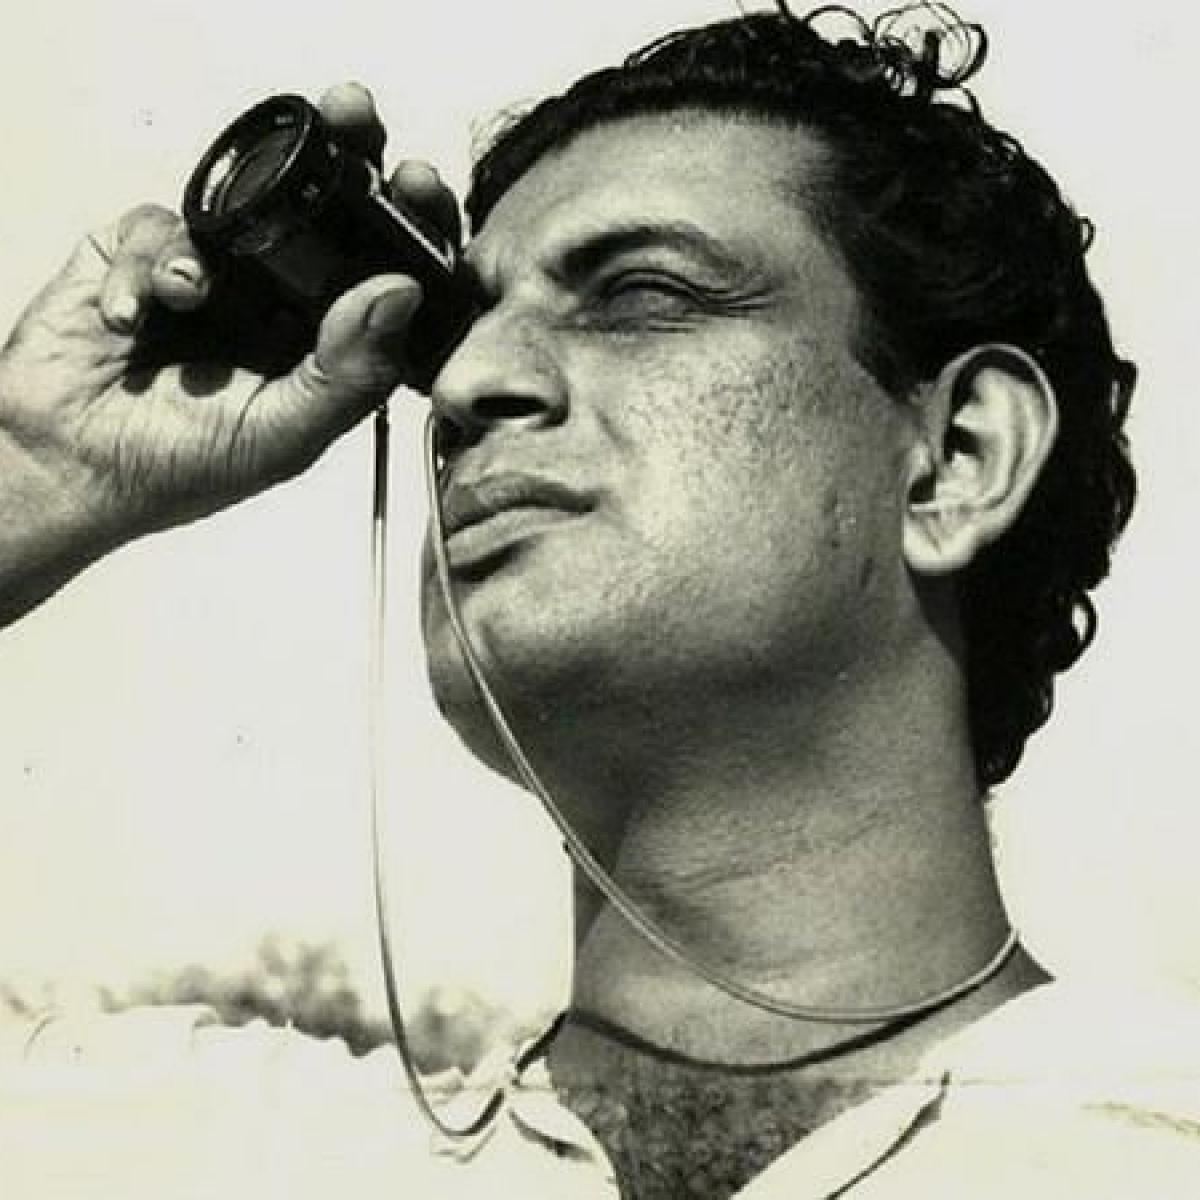 Satyajit Ray Death Anniversary: 5 best movies by the legendary filmmaker